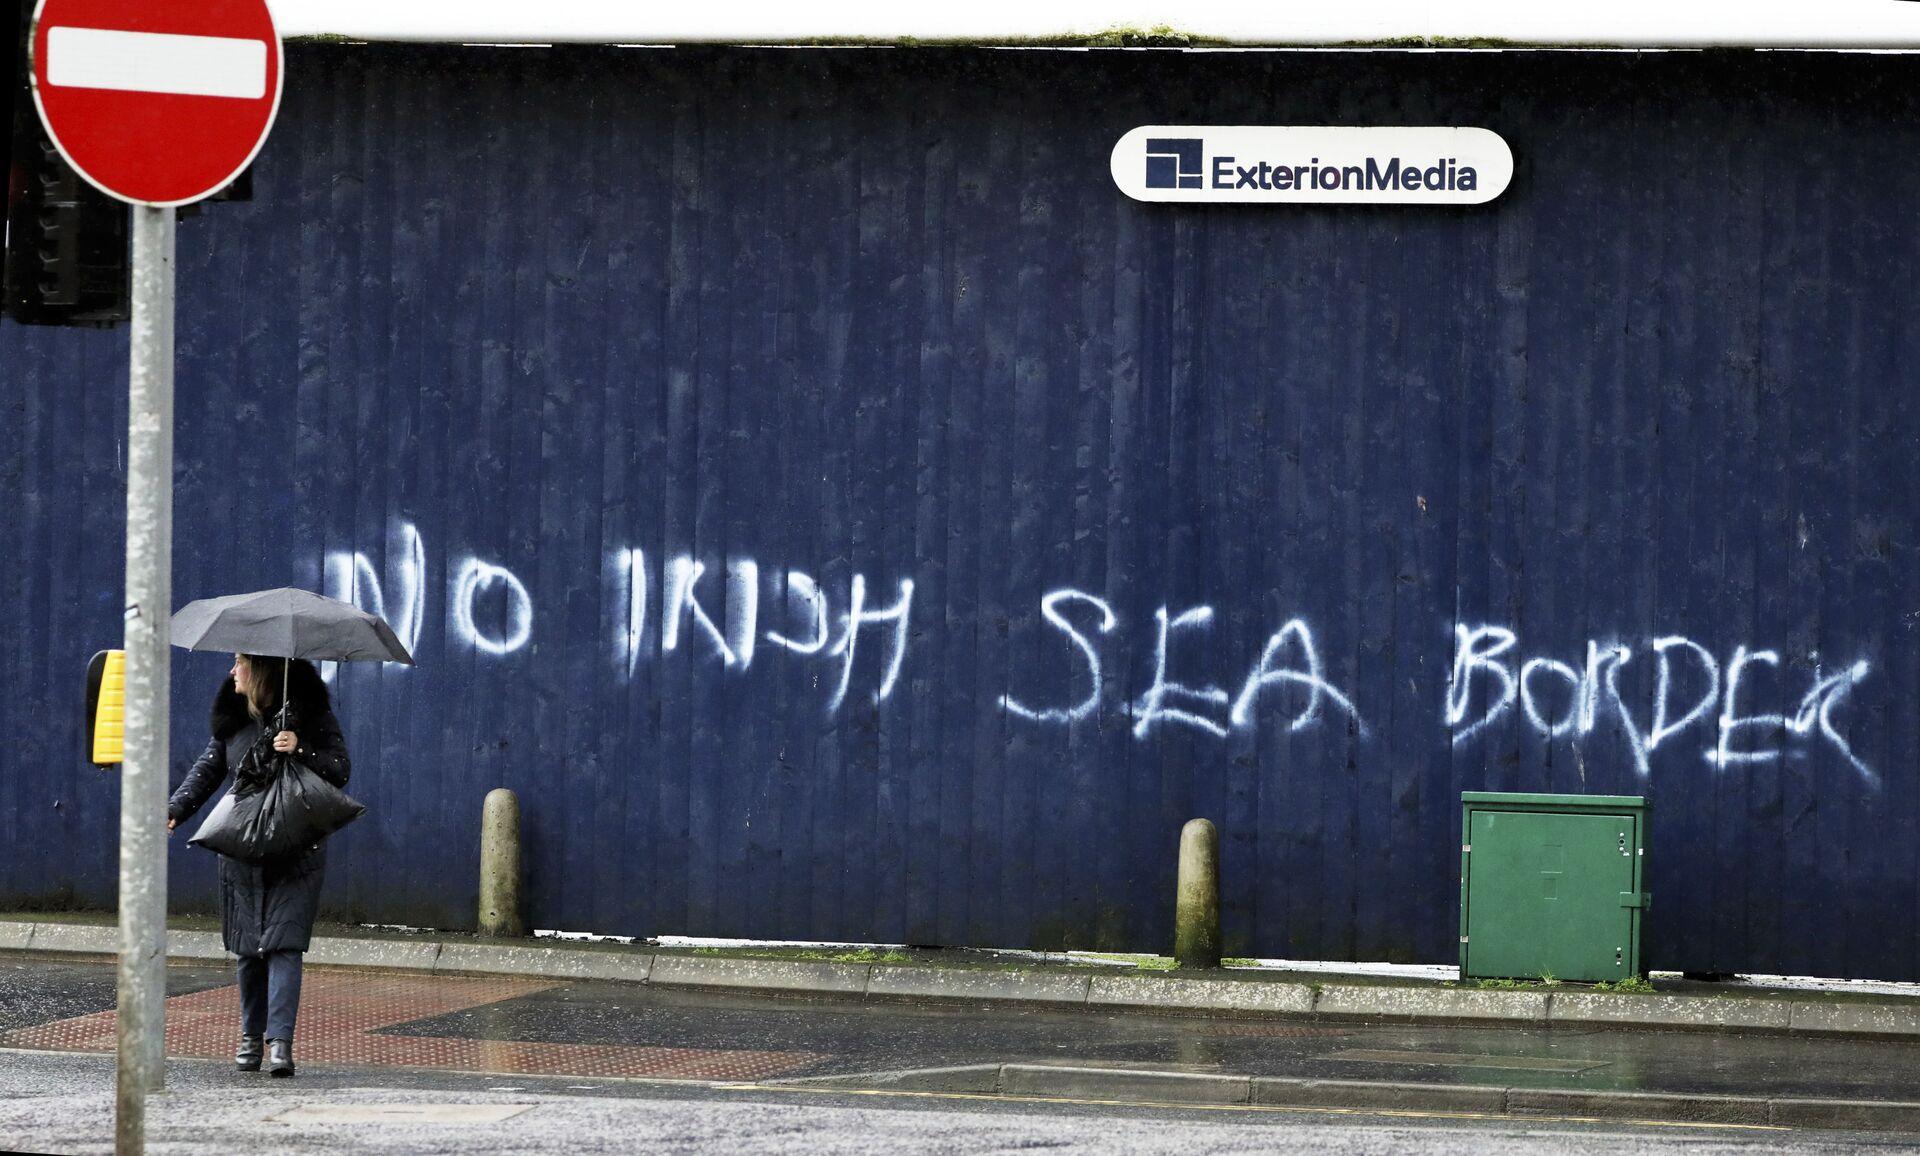 A woman walks past past graffiti with the words 'No Irish Sea Border' in Belfast city centre, Northern Ireland, Wednesday, Feb. 3, 2021 - Sputnik International, 1920, 13.10.2021